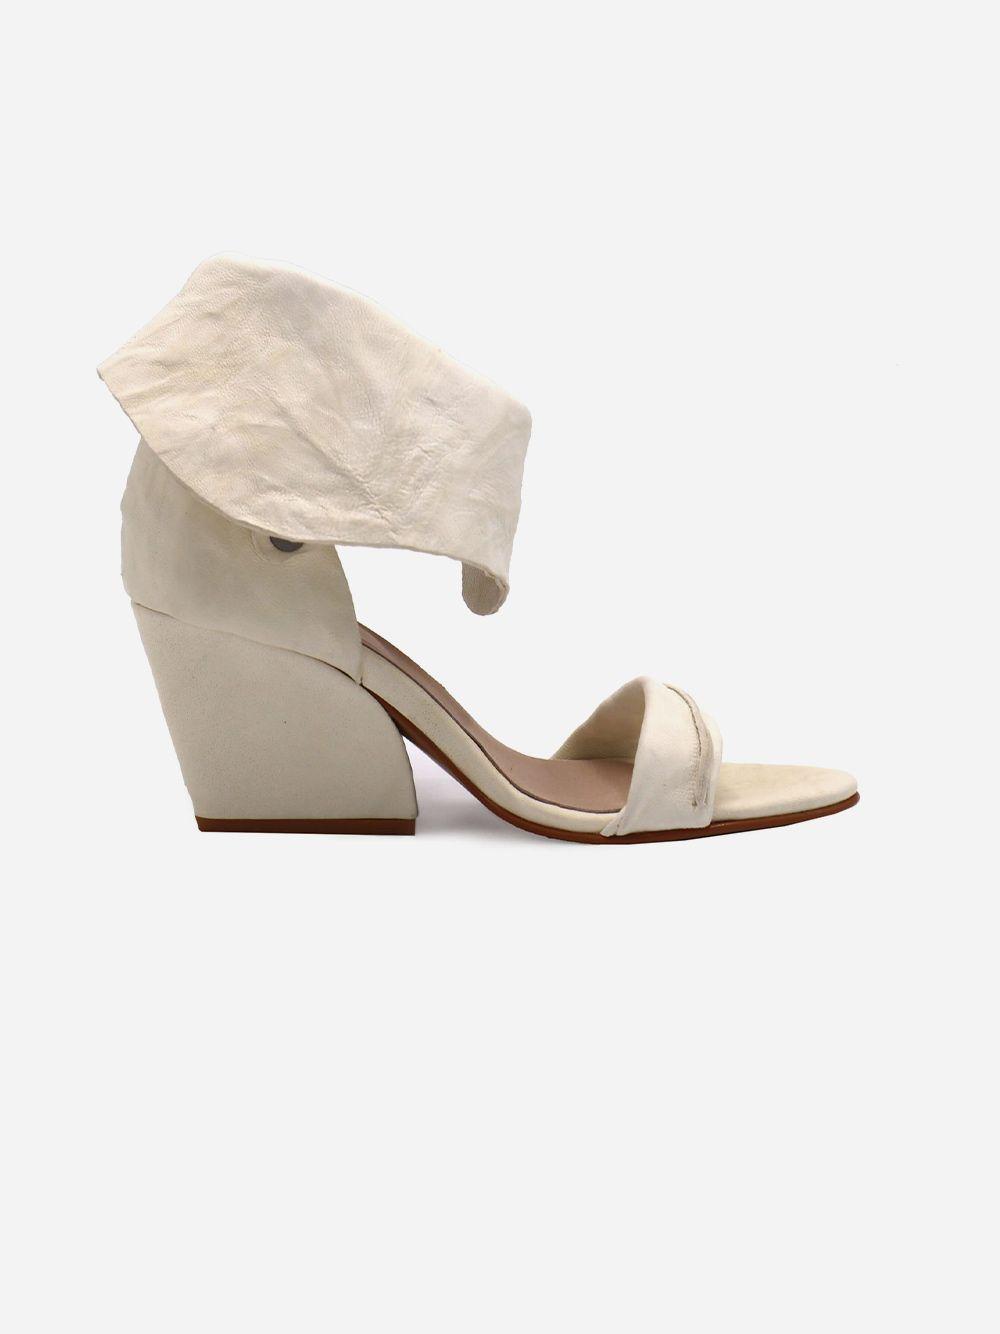 Sandálias Brancas Textura   Pallas